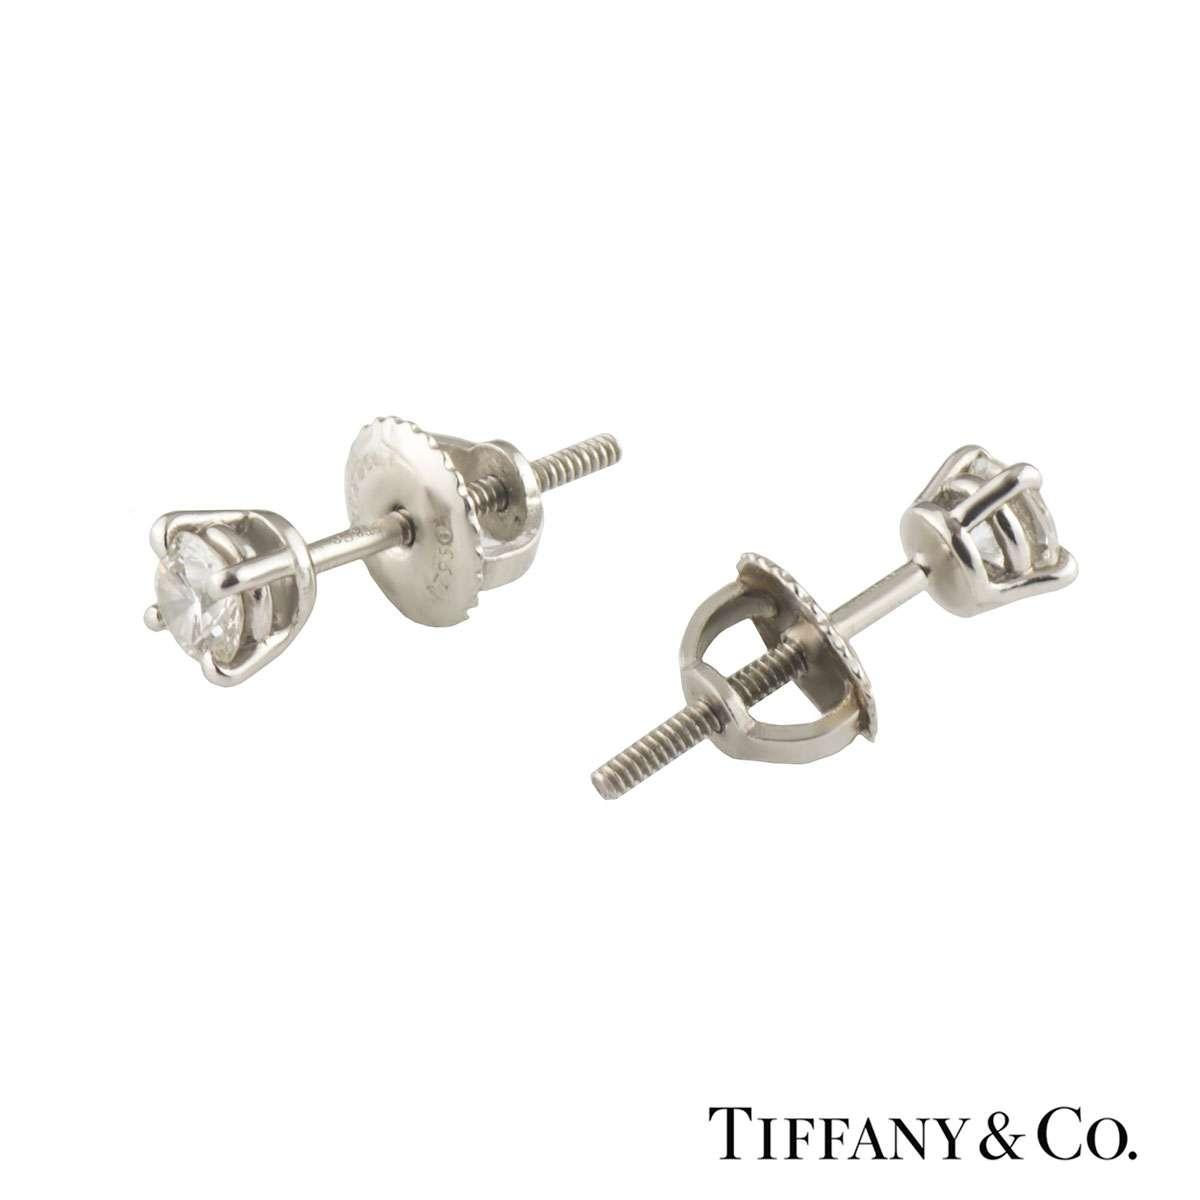 Tiffany & Co. Solitaire Diamond Earrings 0.34ct G/VS